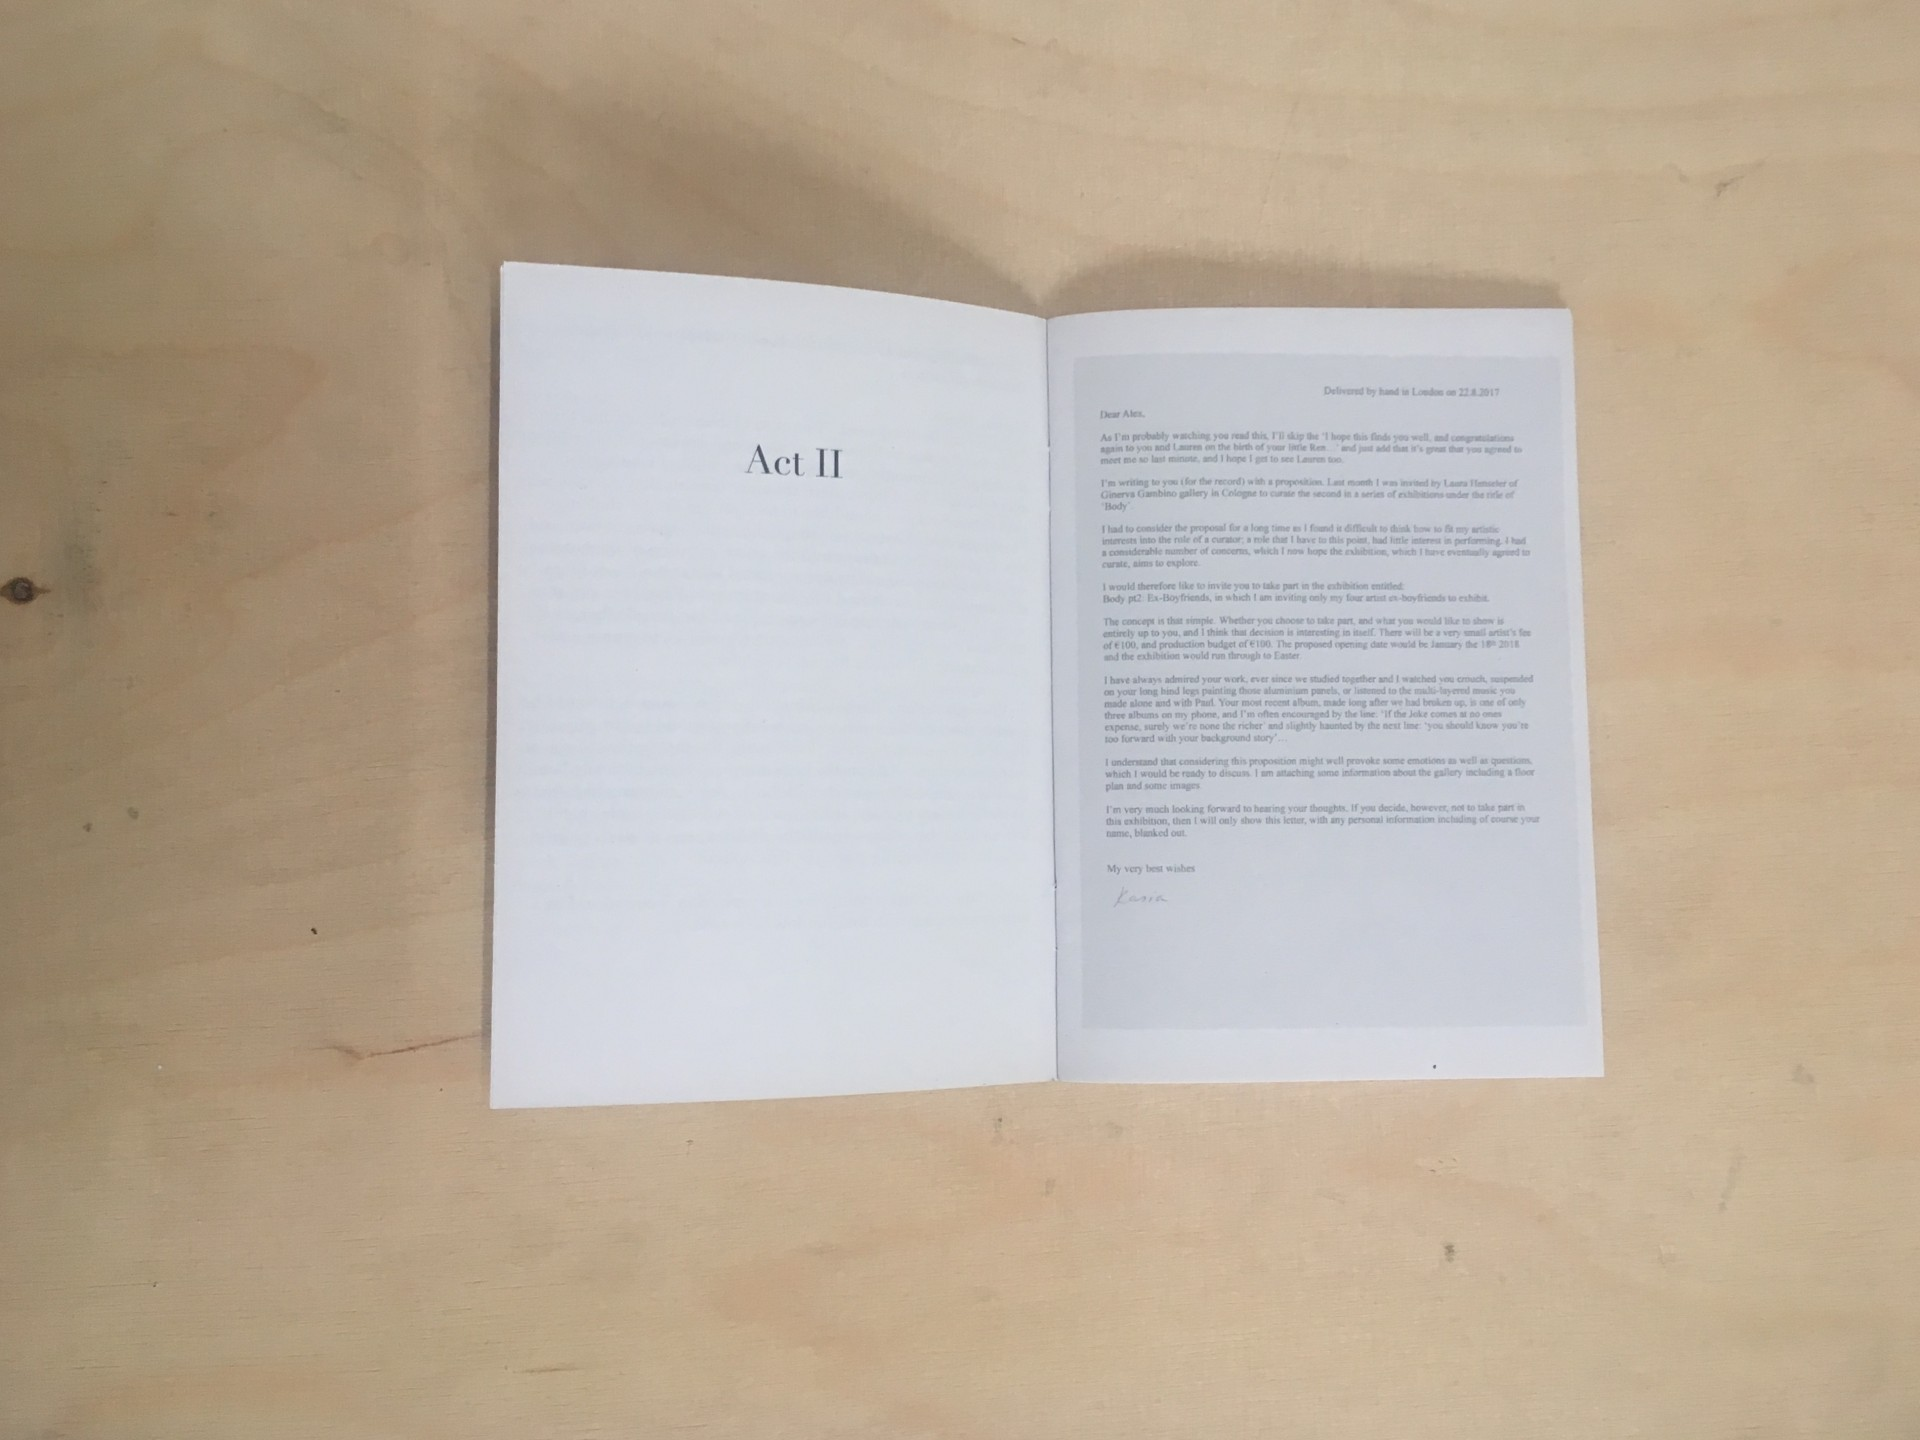 Ginerva Gambino Body pt 2 (Ex-hibition) Booklet